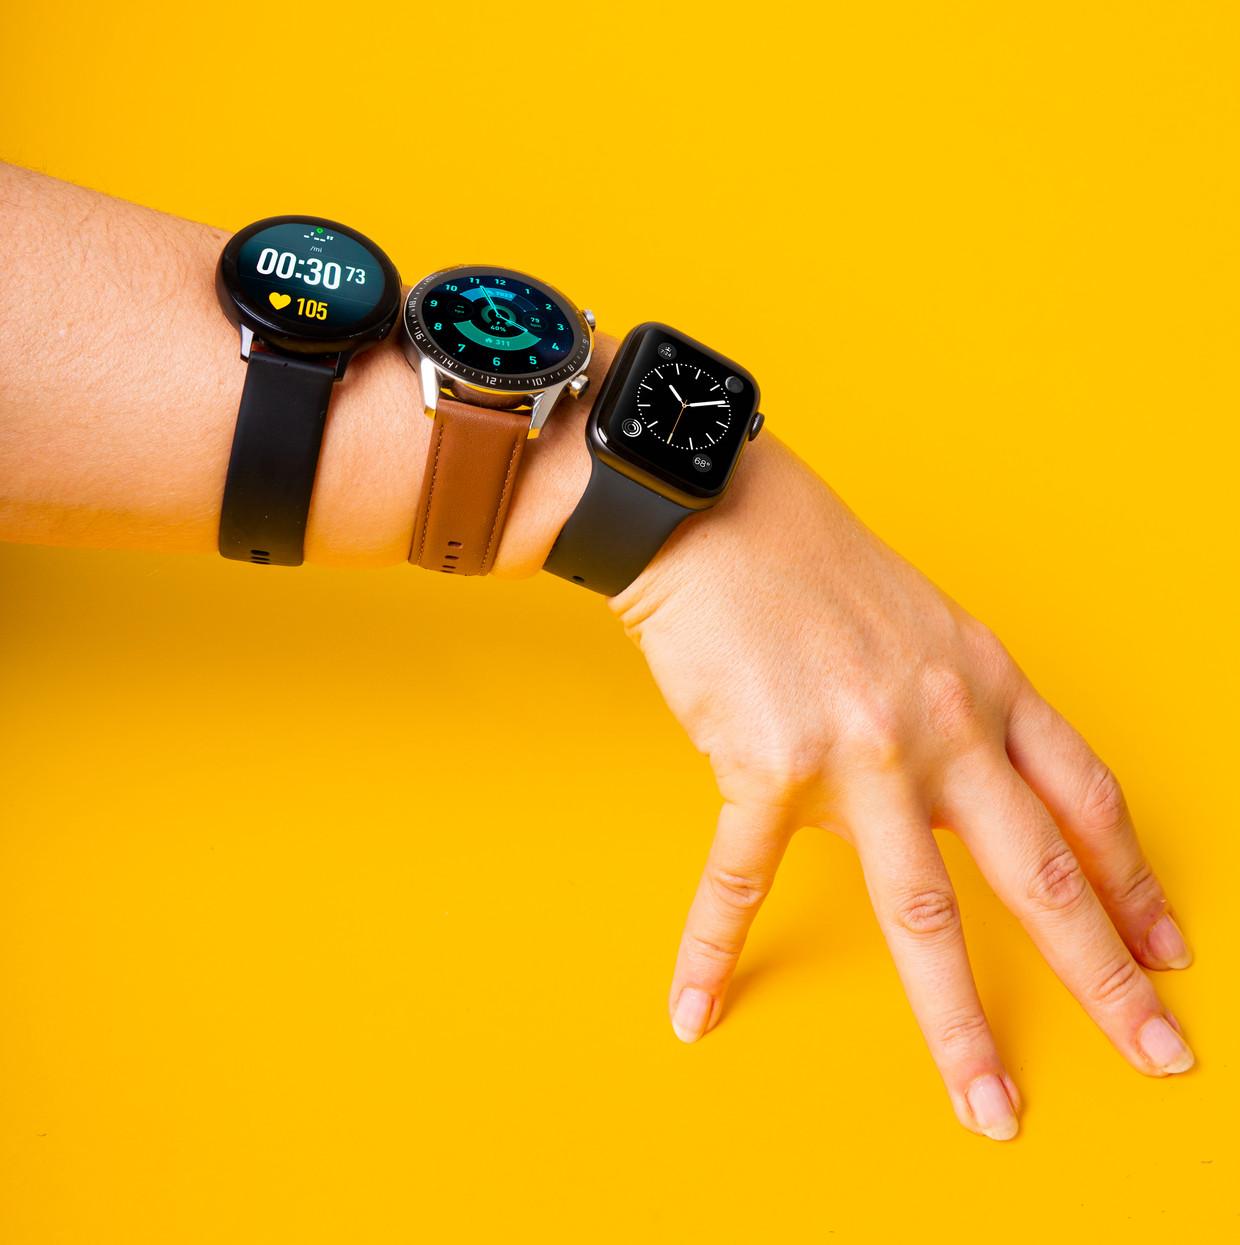 De Volkskrant testte drie smart watches: die van Samsung, Huawei en Apple (op de foto in die volgorde te zien).